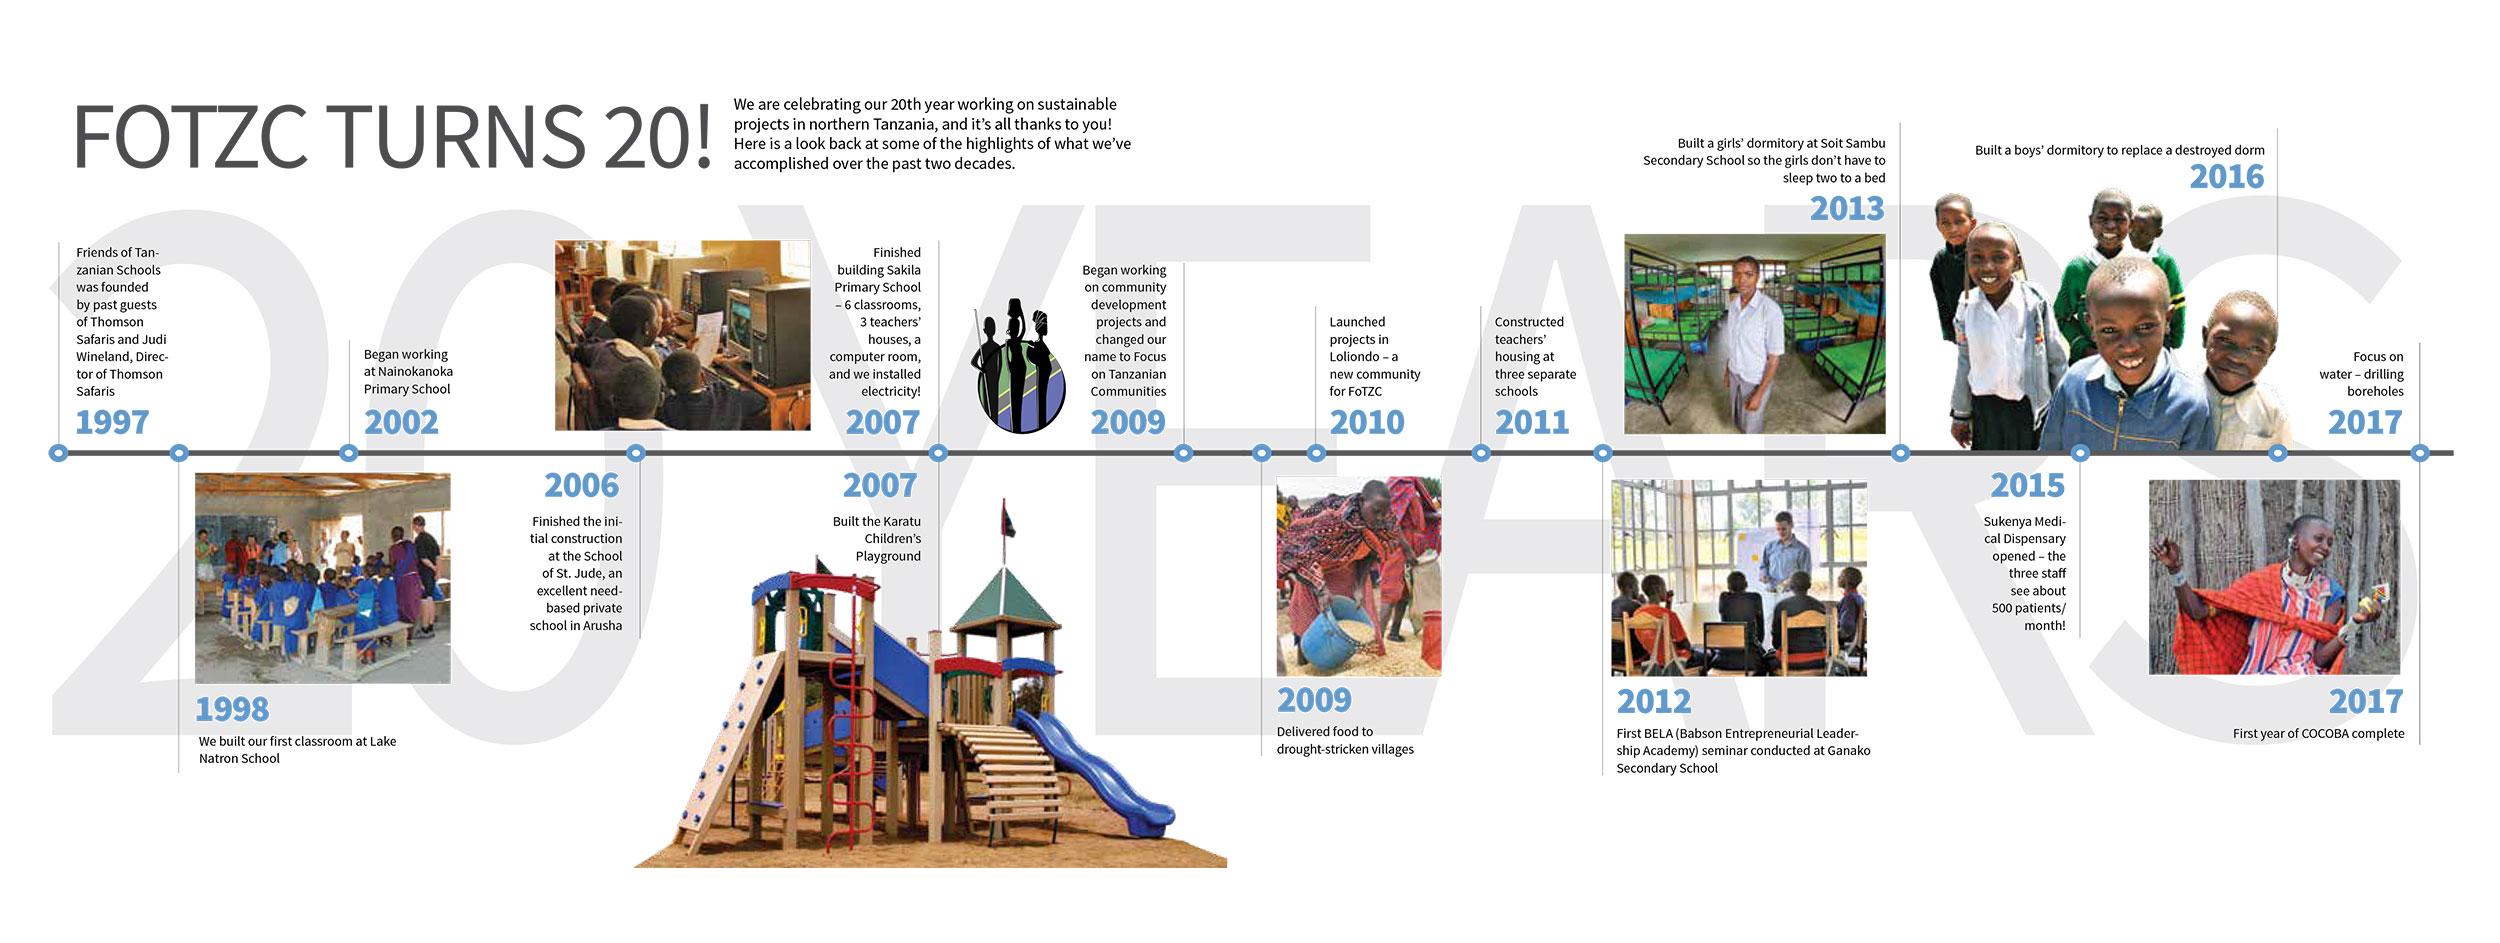 20-anniversary_timeline_2500x943.jpg